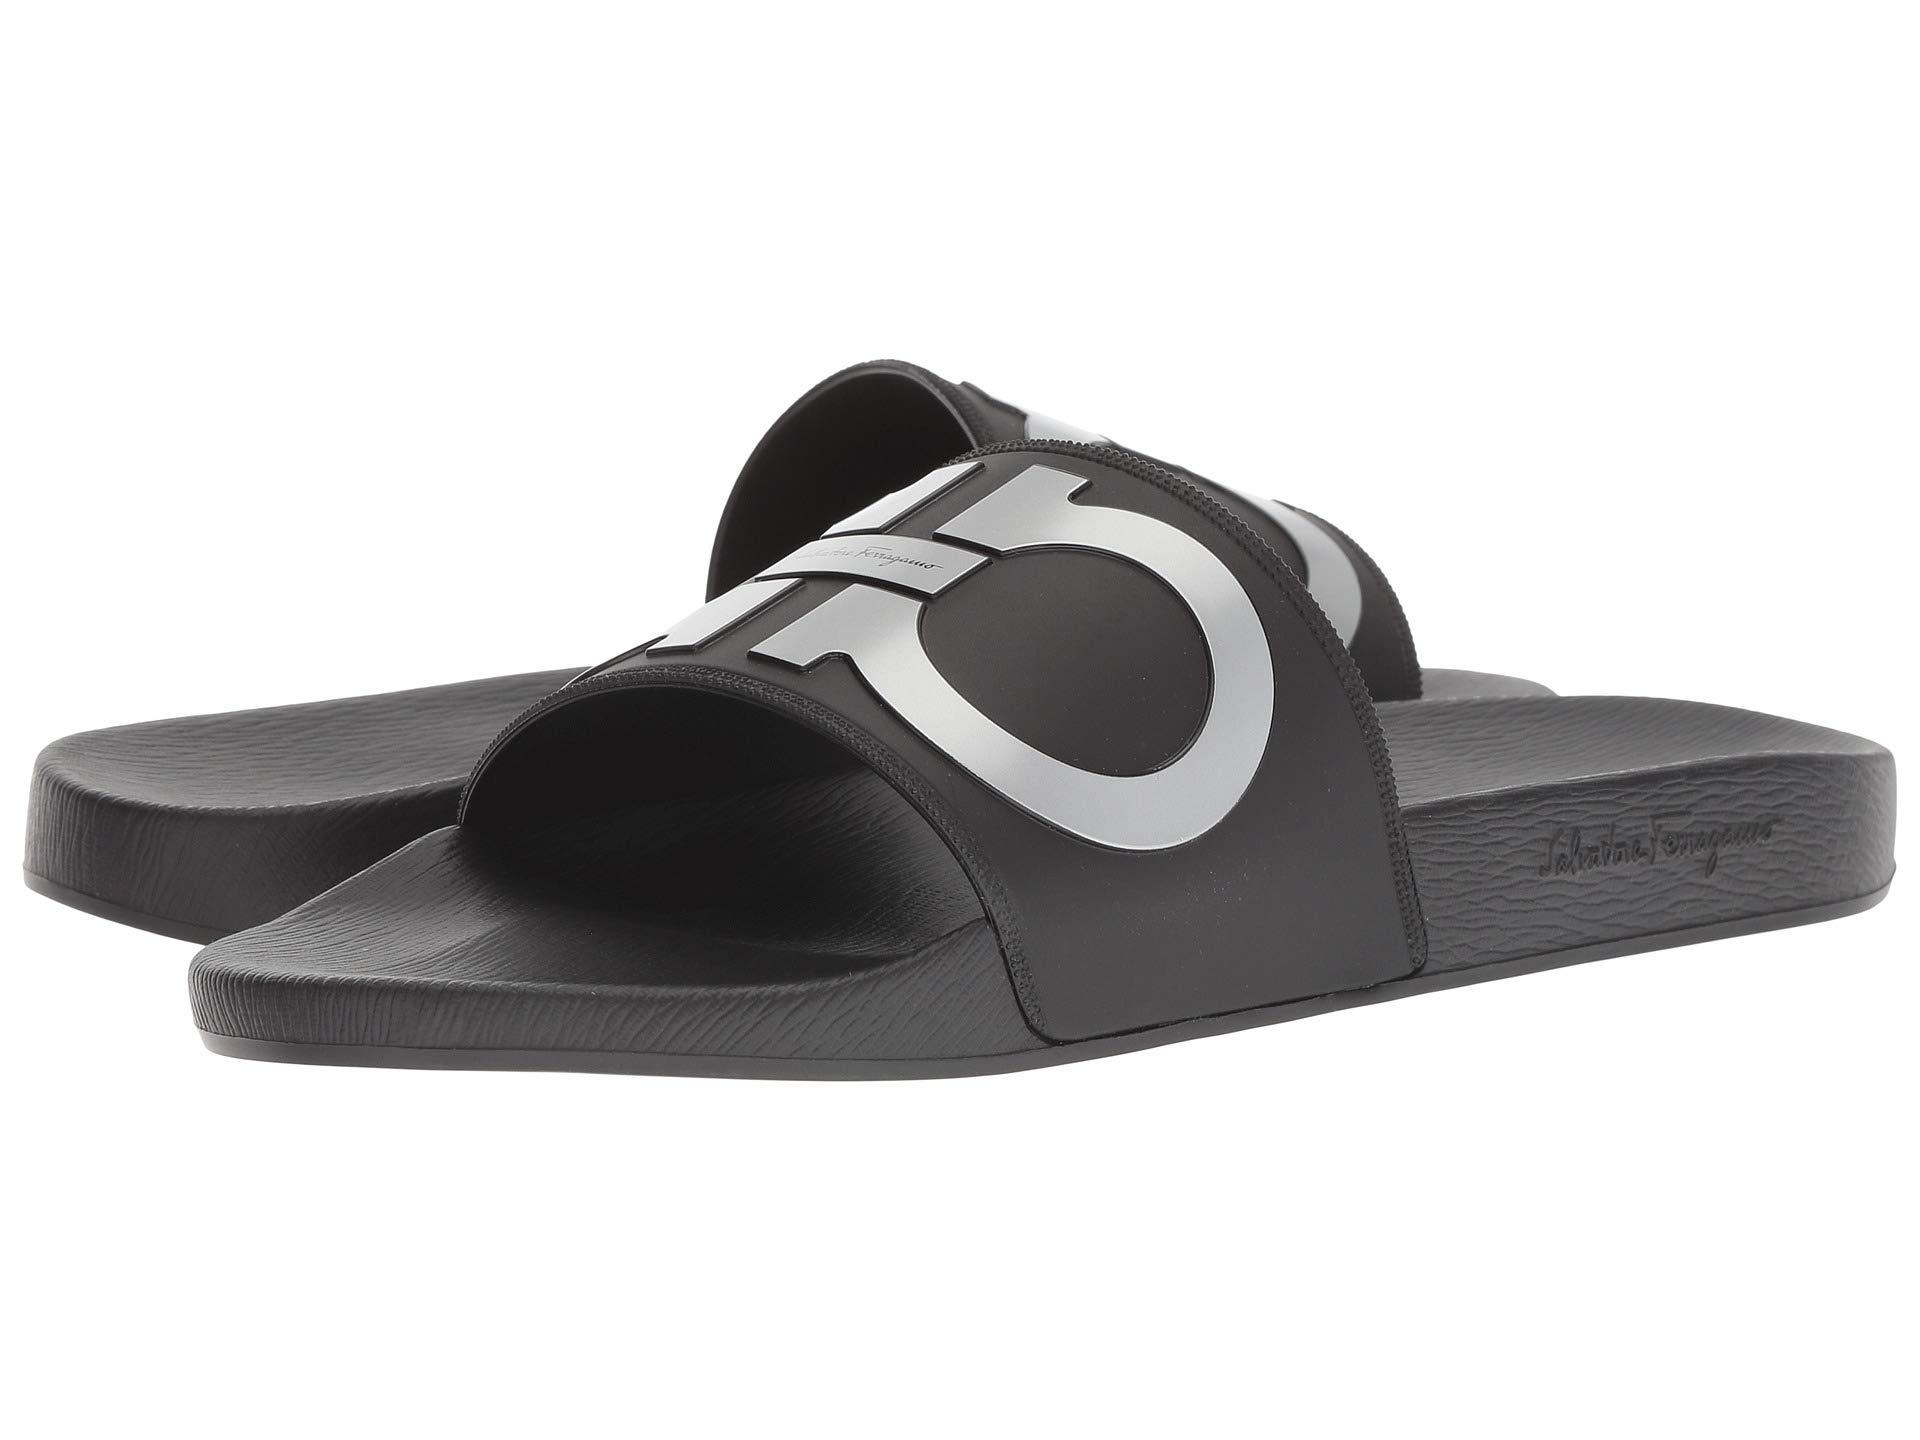 31a18ae3346927 Salvatore Ferragamo Groove 2 Sandal at Luxury.Zappos.com